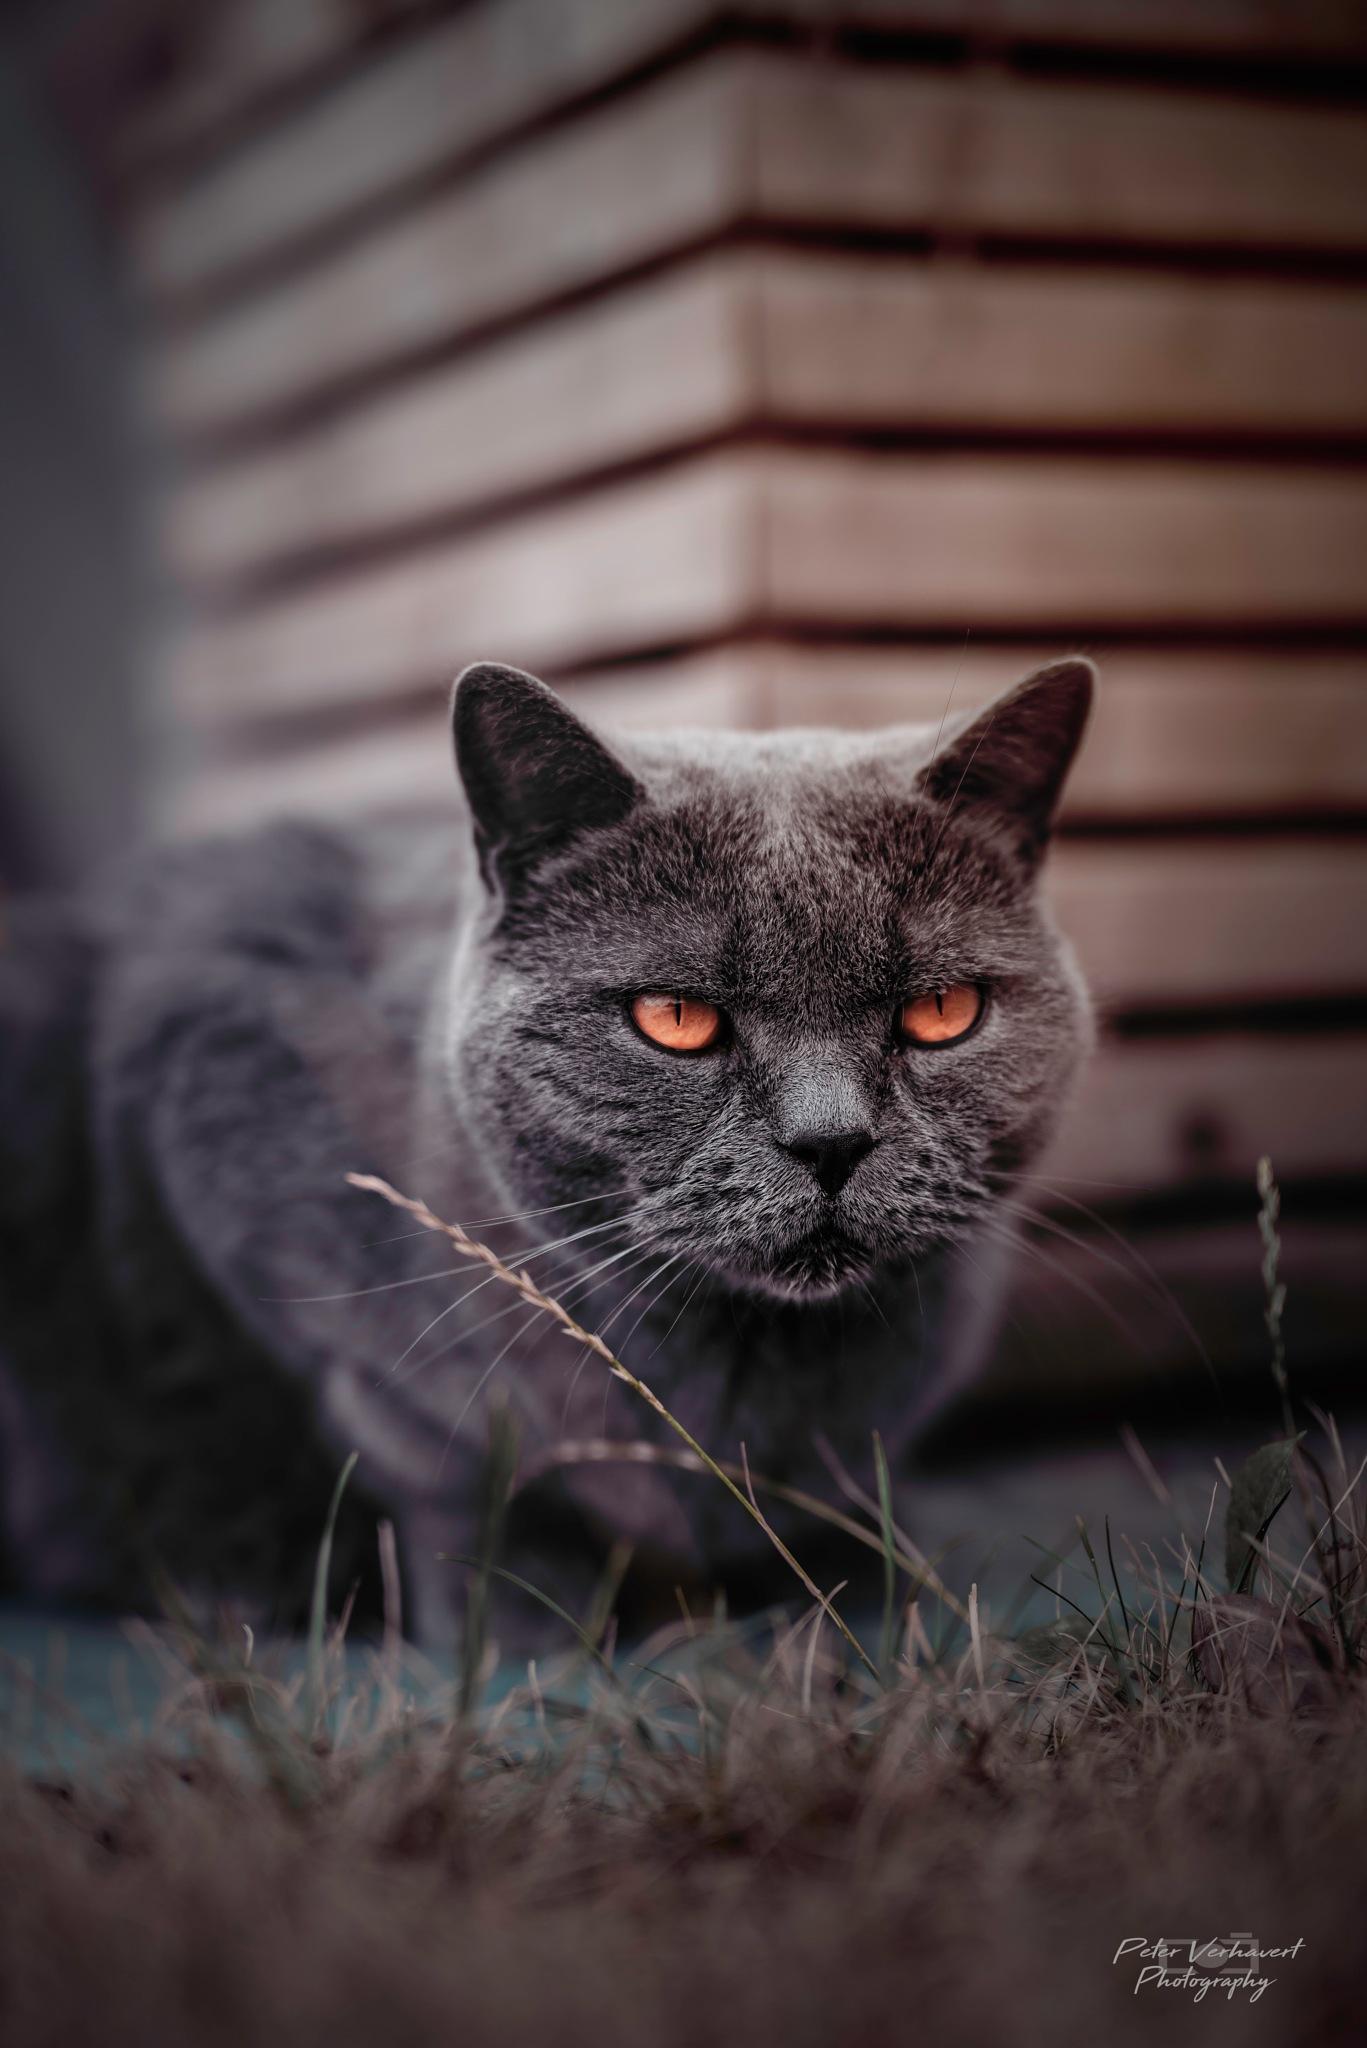 devilish cat by ronin18